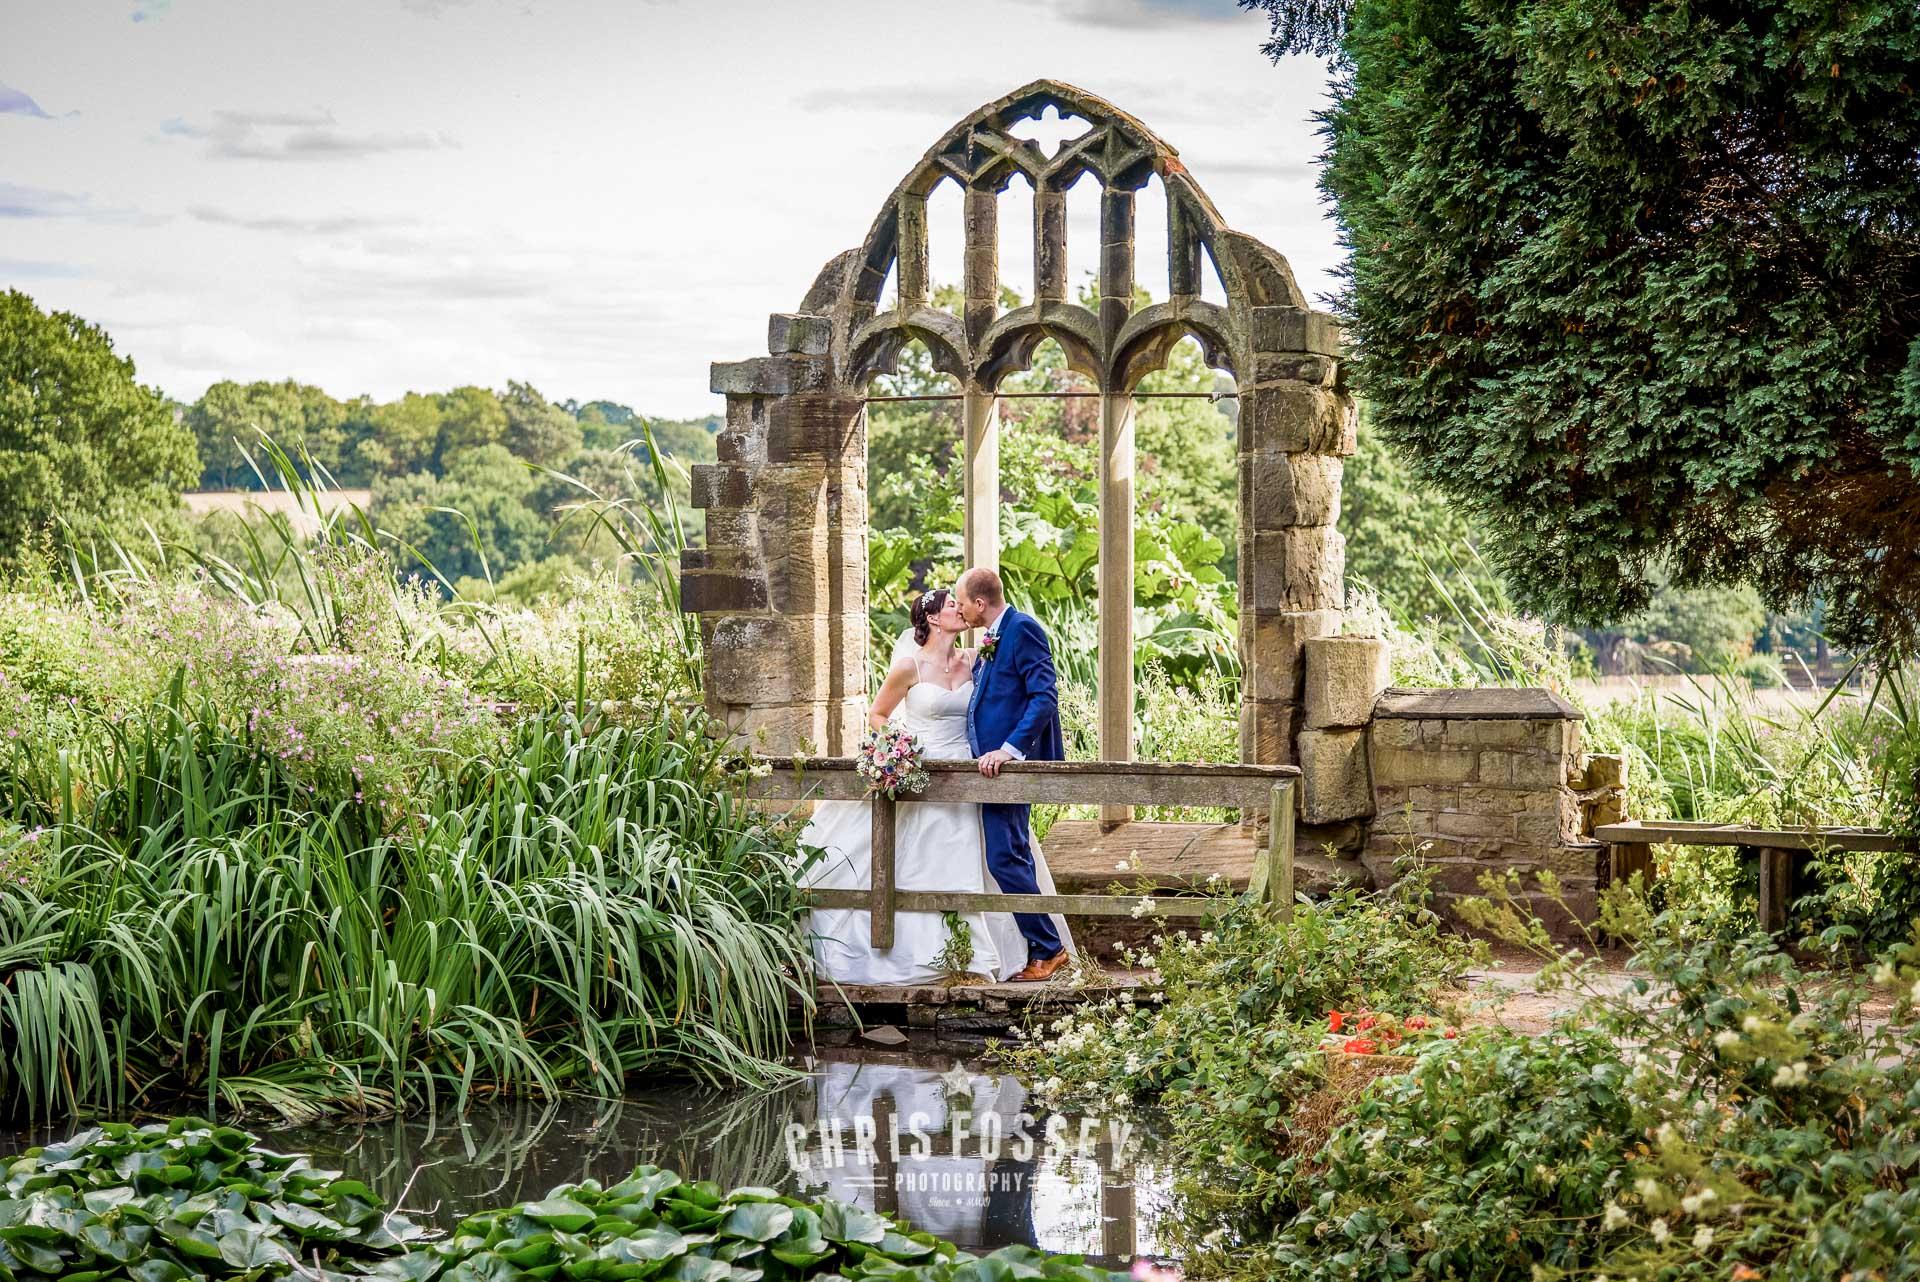 Warwickshire Wedding Photography Portfolio-Yorkshire Wedding Photography by Chris Fossey-123